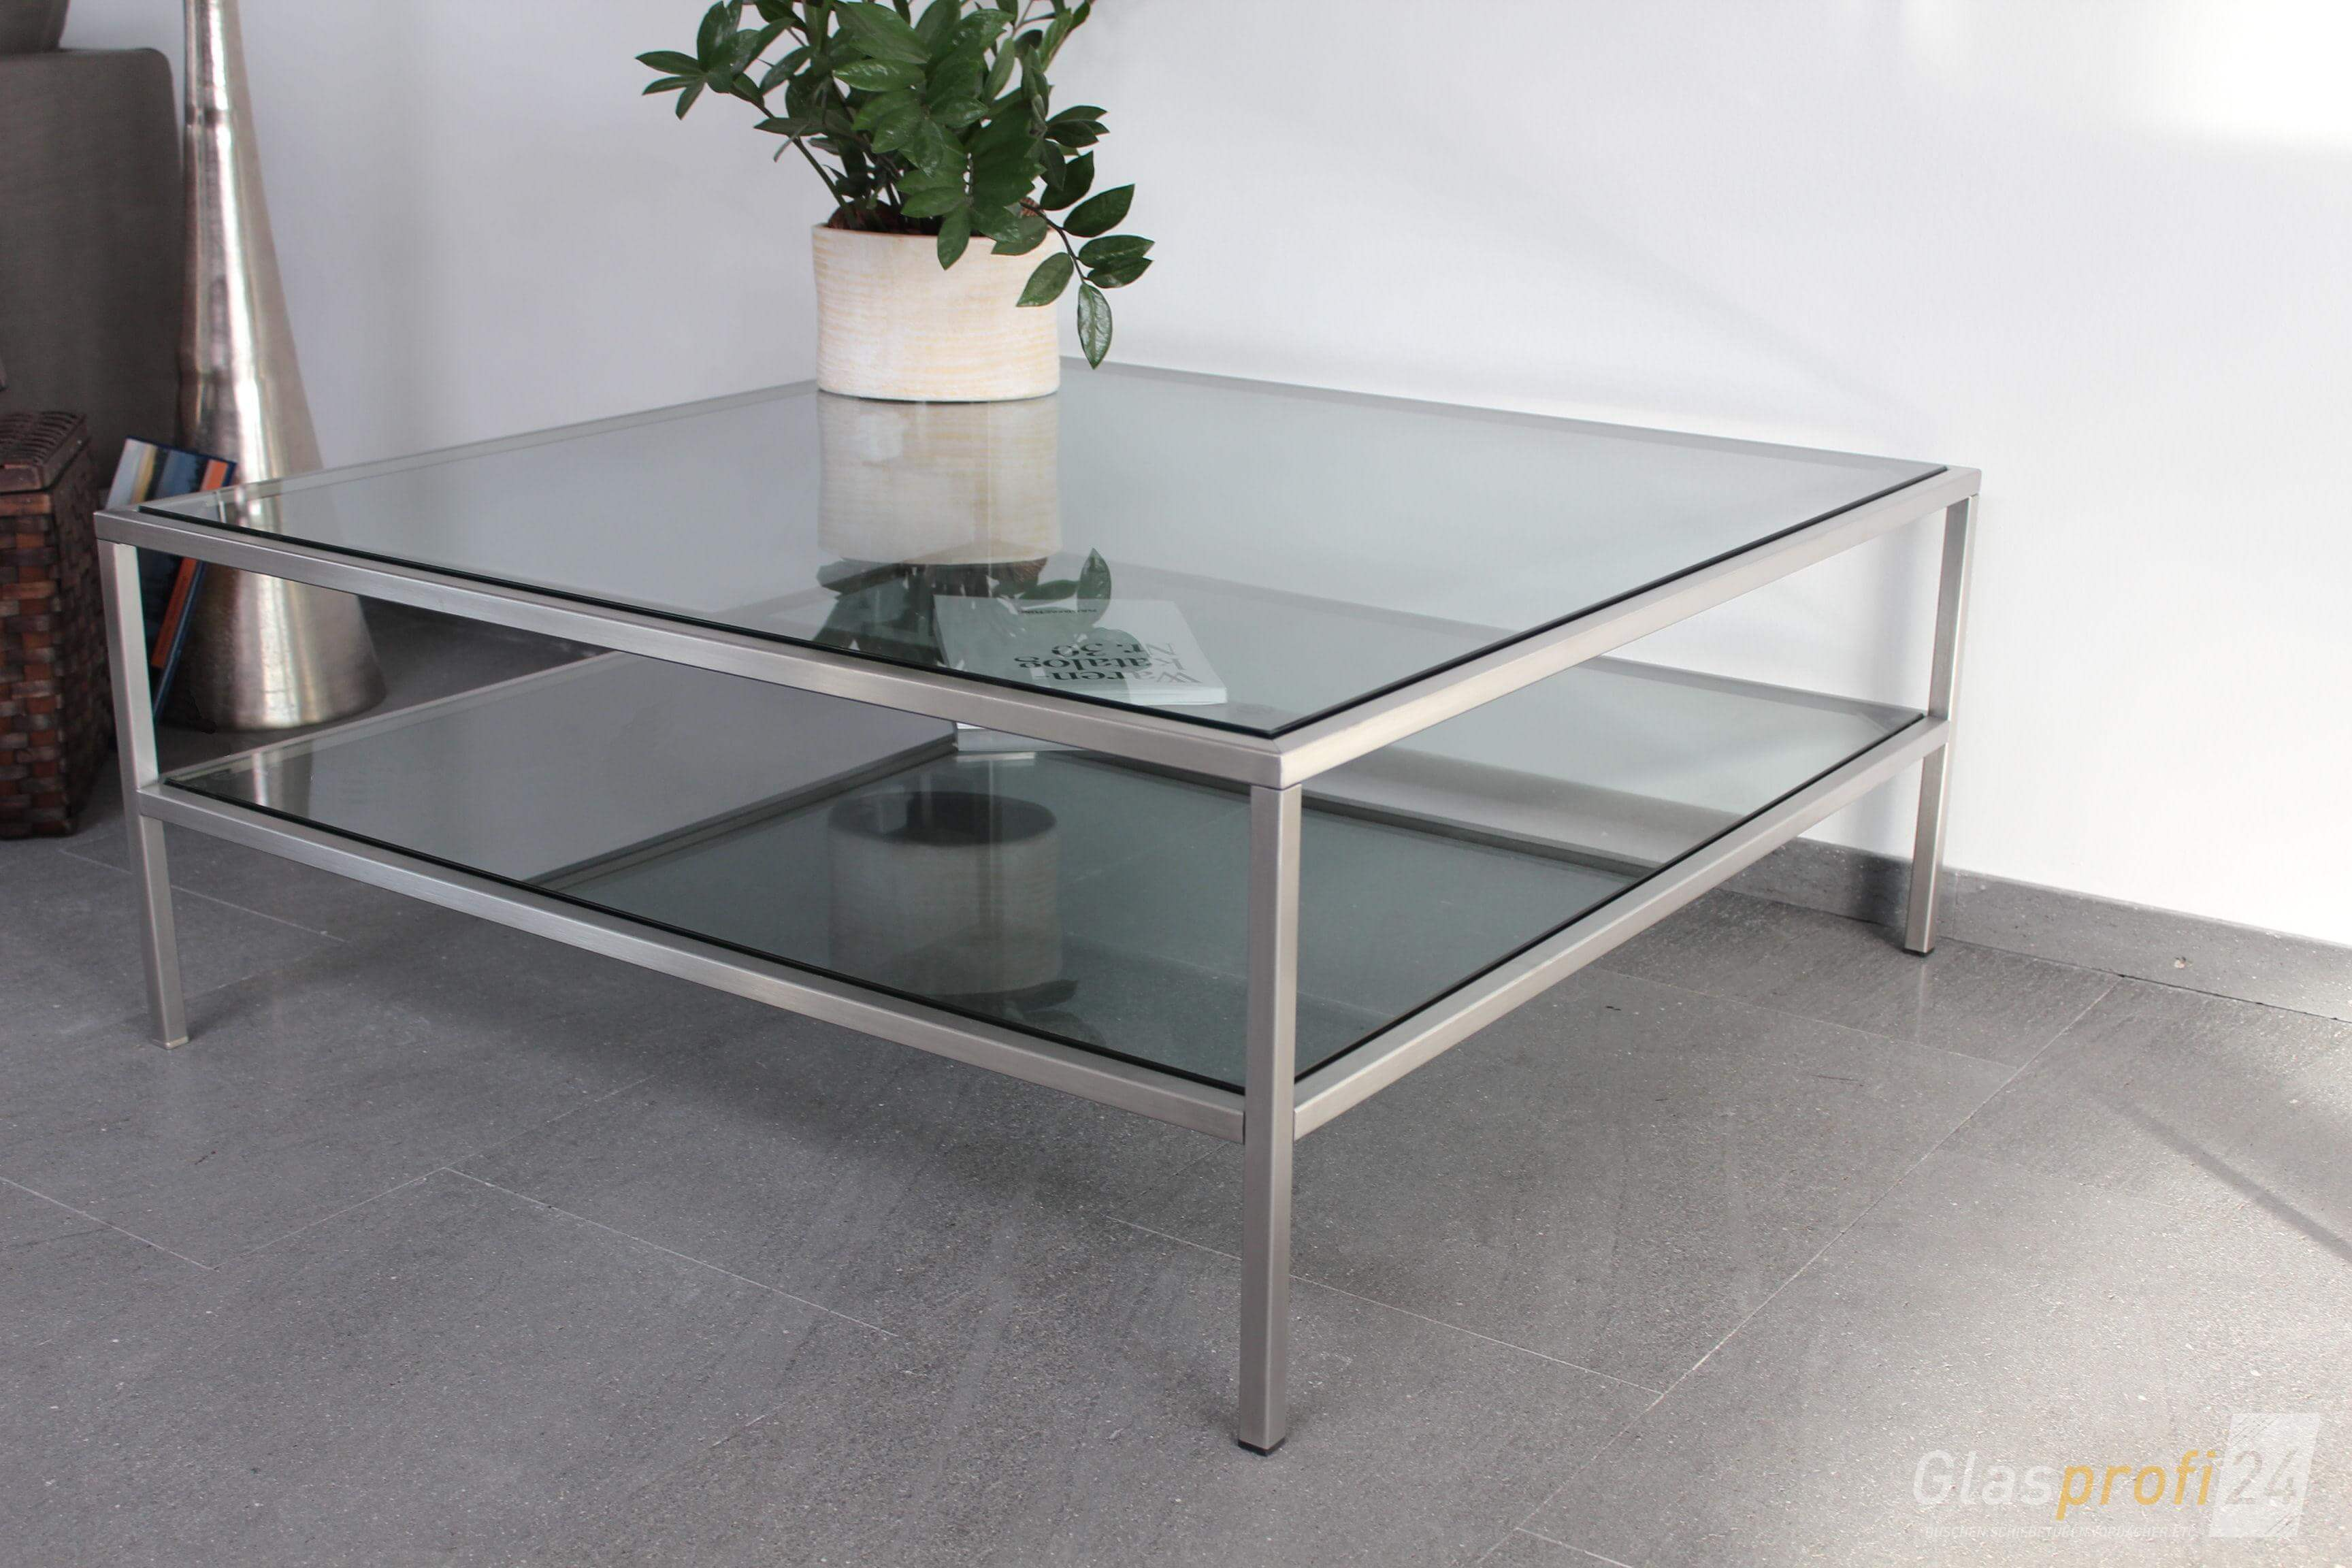 glasplatte couchtisch latest full size of holz glas couchtisch buche glasplatte holz oval glas. Black Bedroom Furniture Sets. Home Design Ideas